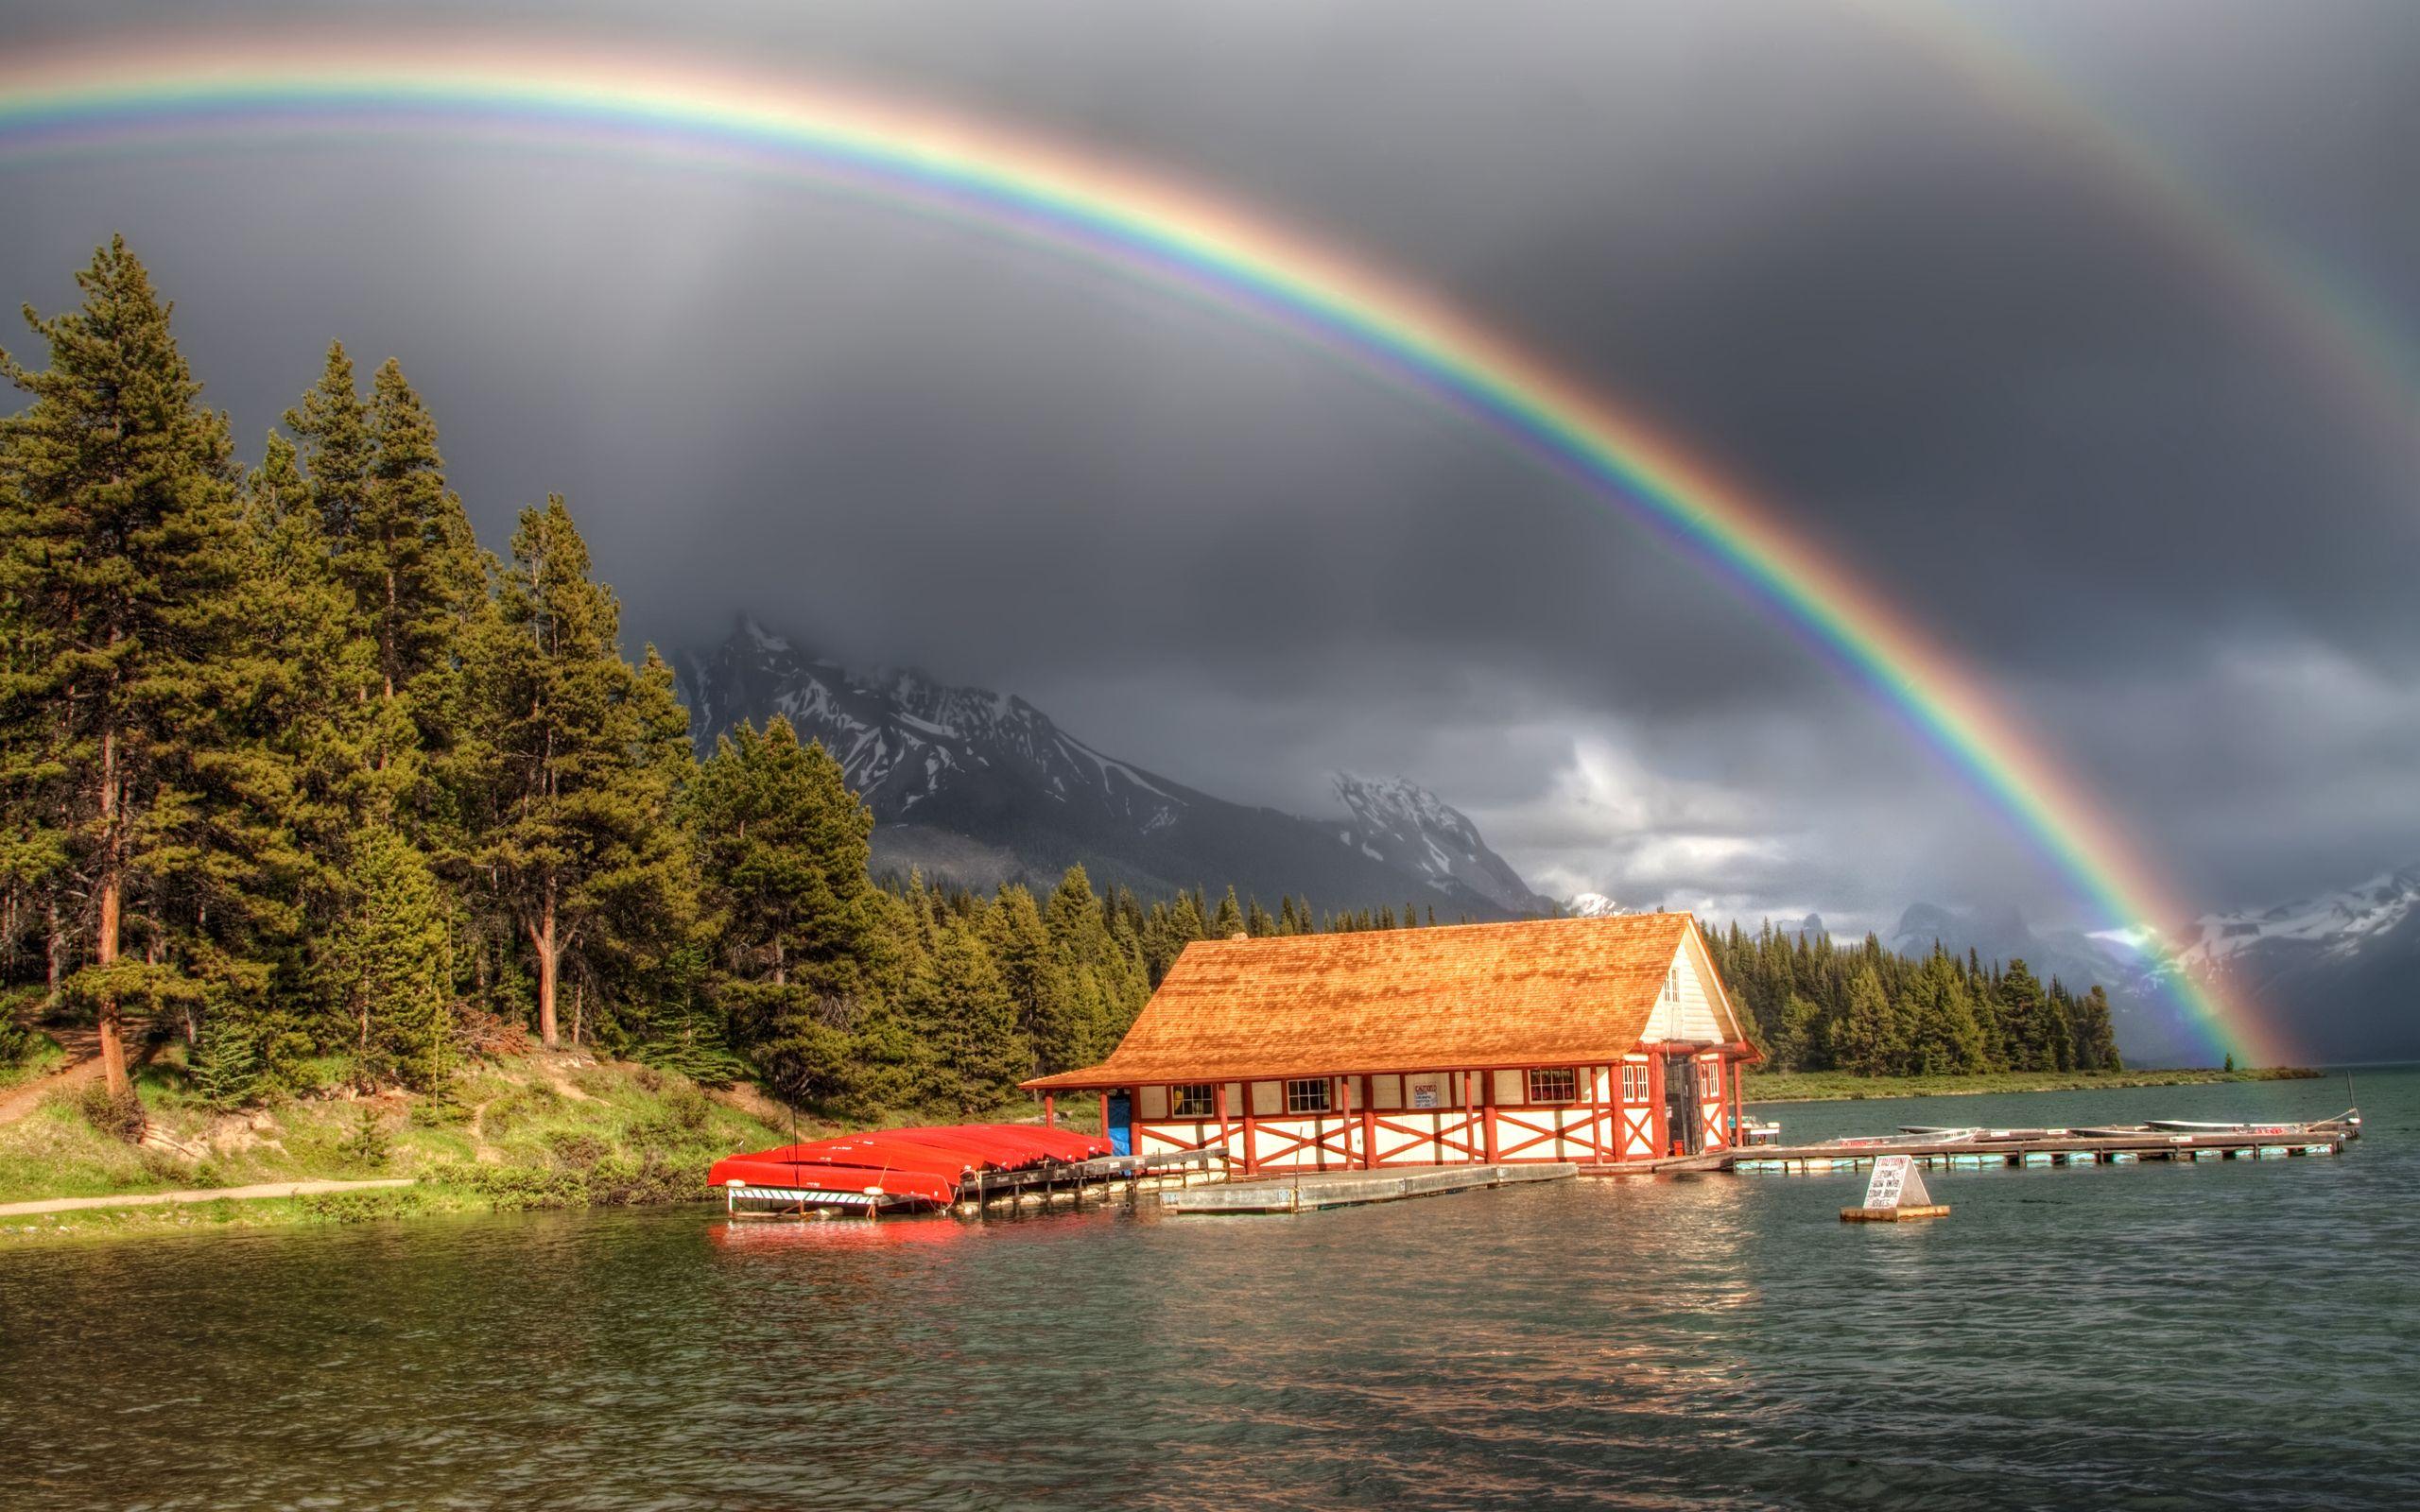 Hd wallpaper rainbow - Rainbow Hd Wallpapers Page 0 High Resolution Wallarthd Com